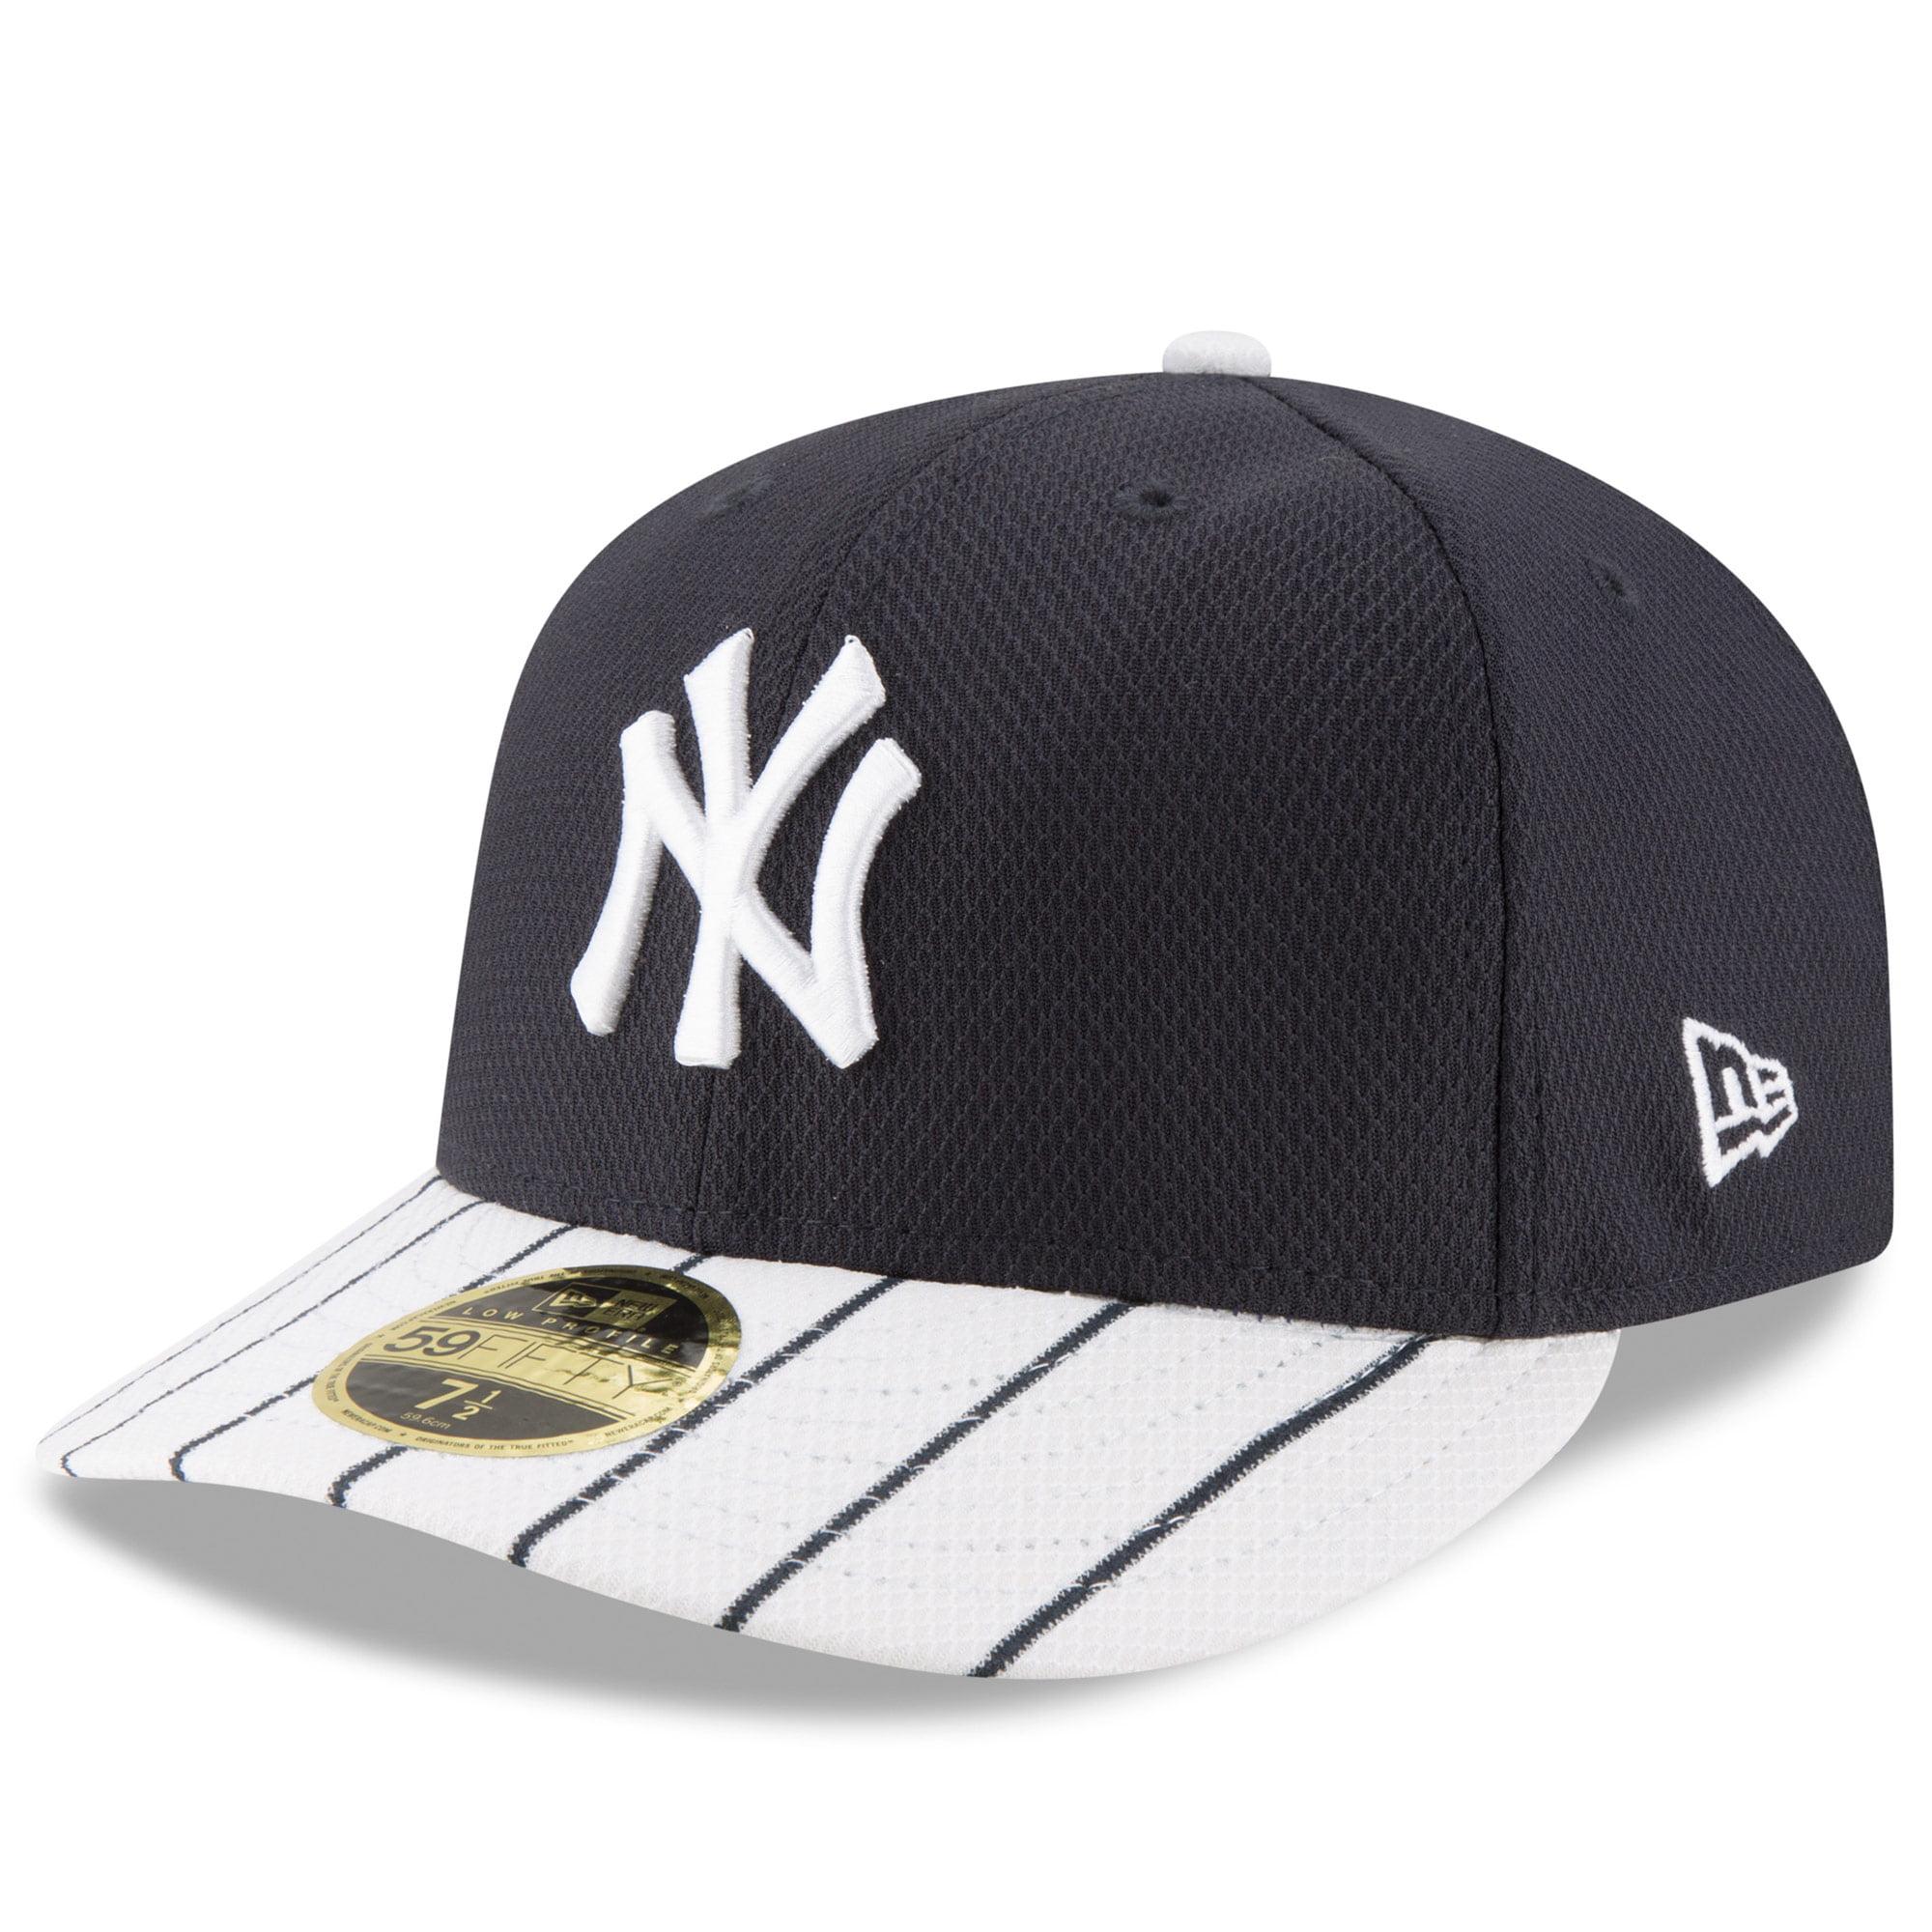 e19bdc3bbf4ecc New York Yankees New Era Diamond Era 59FIFTY Low Profile Fitted Hat -  Navy/White - Walmart.com